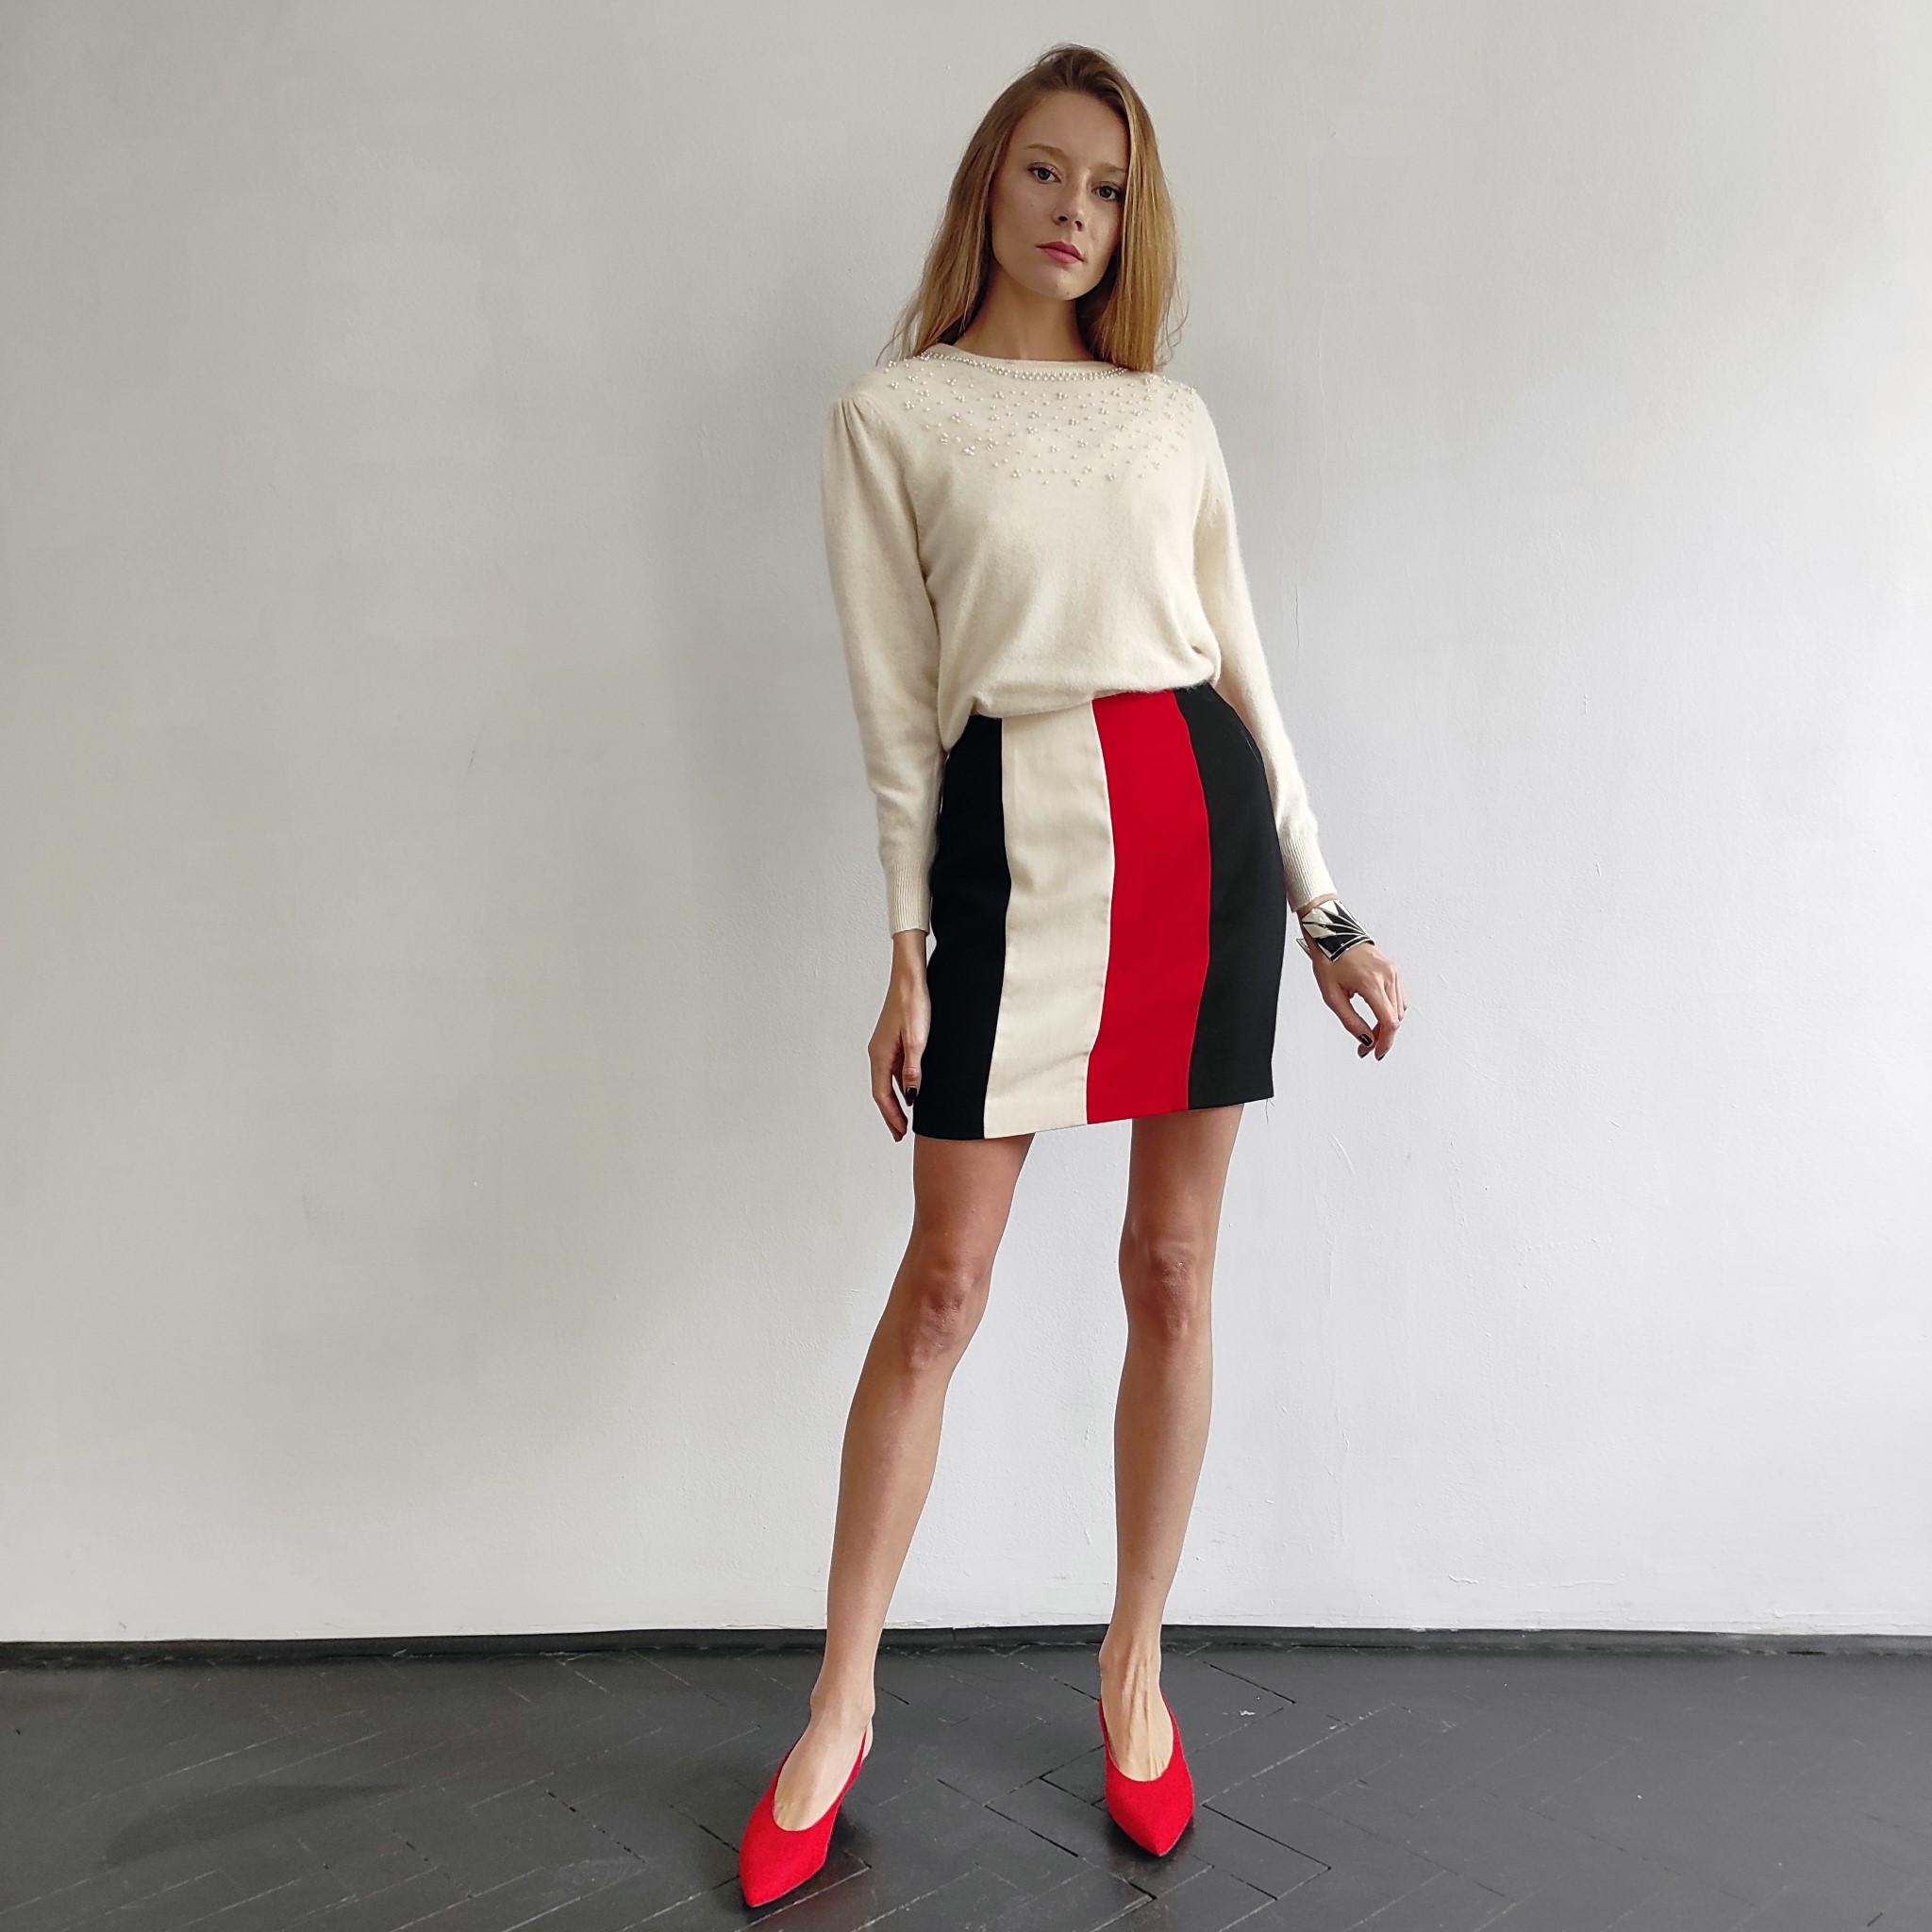 Spódnica z wełny Ellen Tracy black red white - KEX Vintage Store | JestemSlow.pl